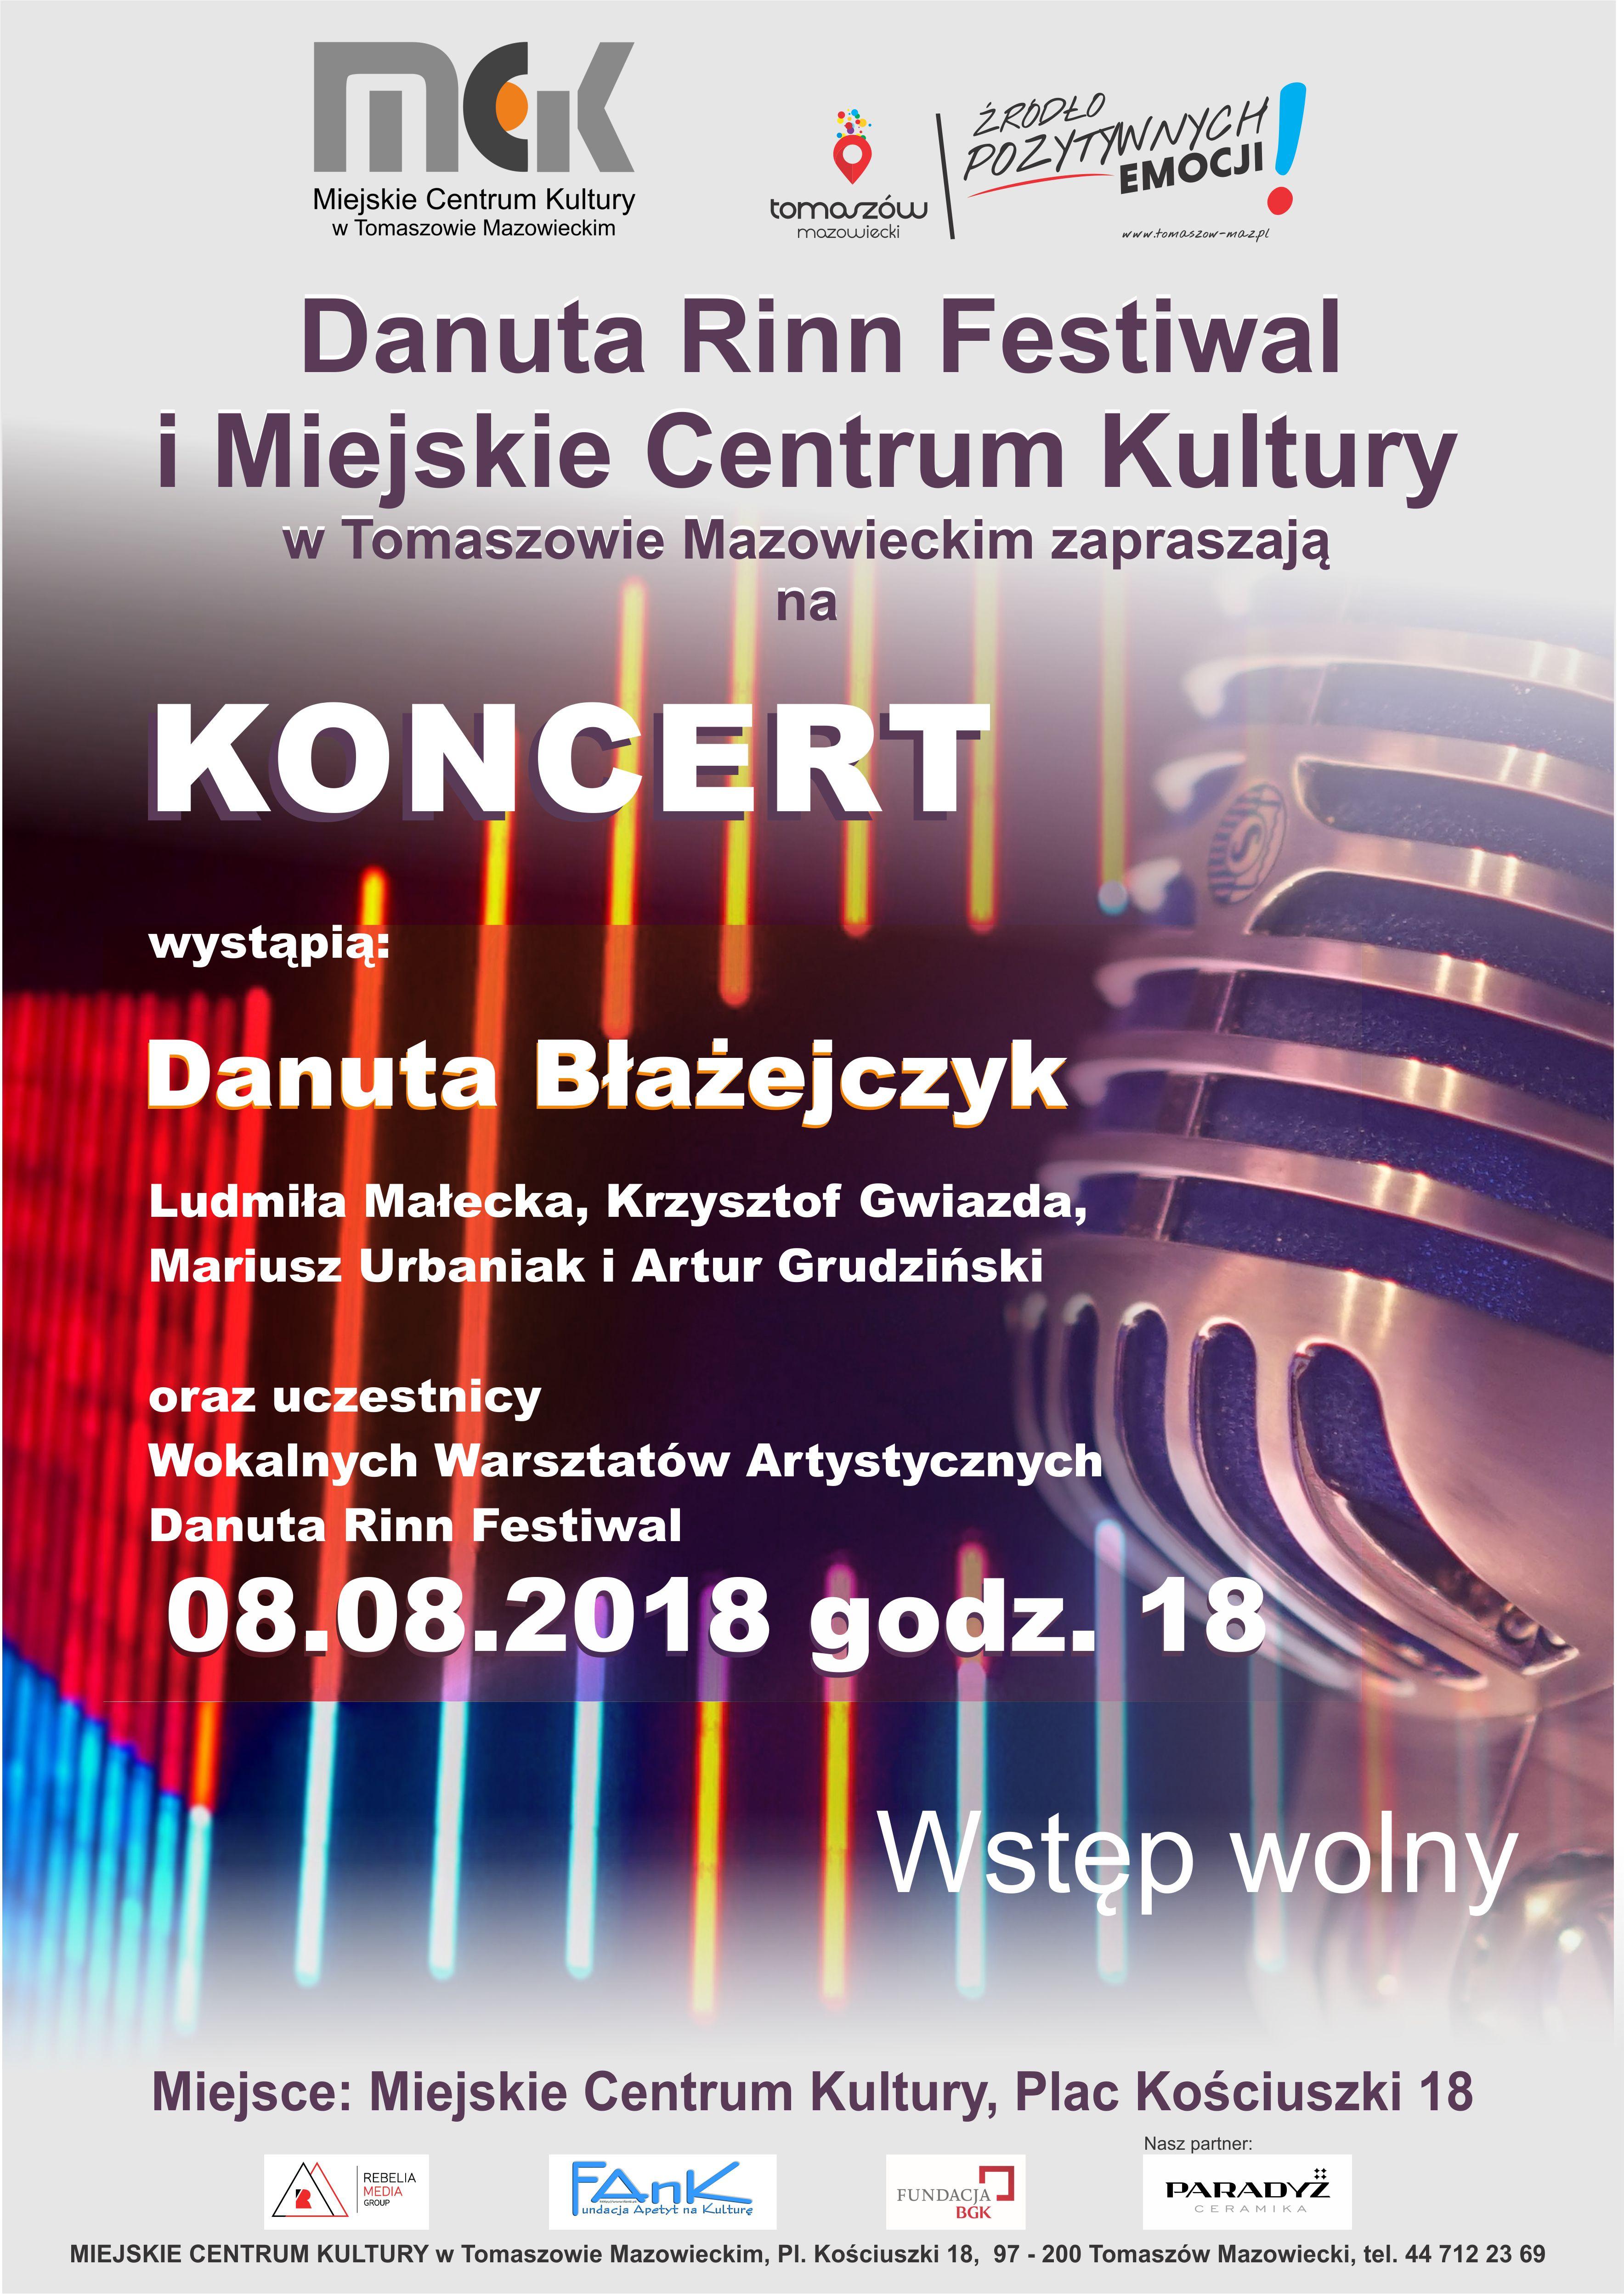 Danuta Rinn festiwal